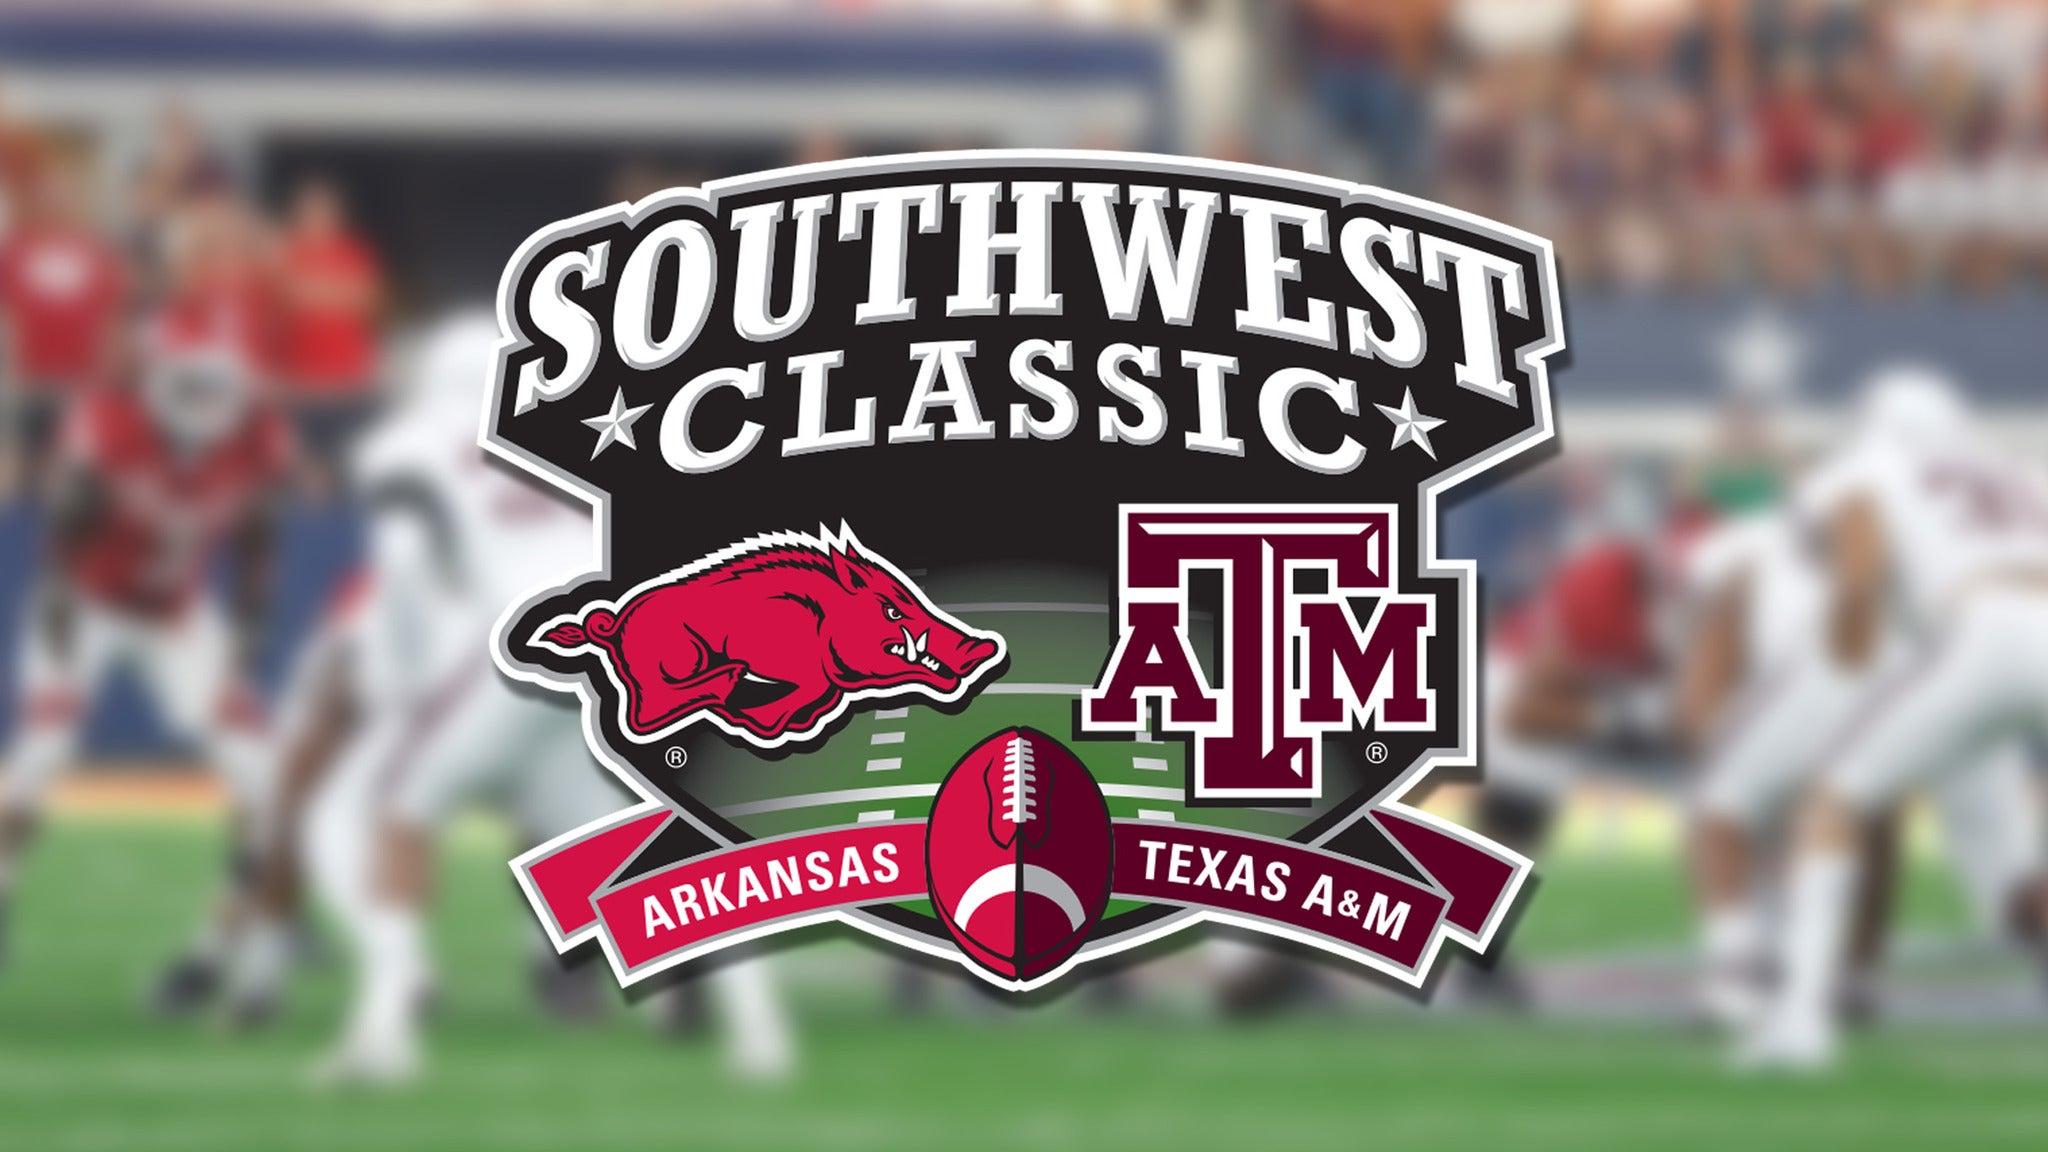 Southwest Classic vs. Arkansas Razorbacks Football